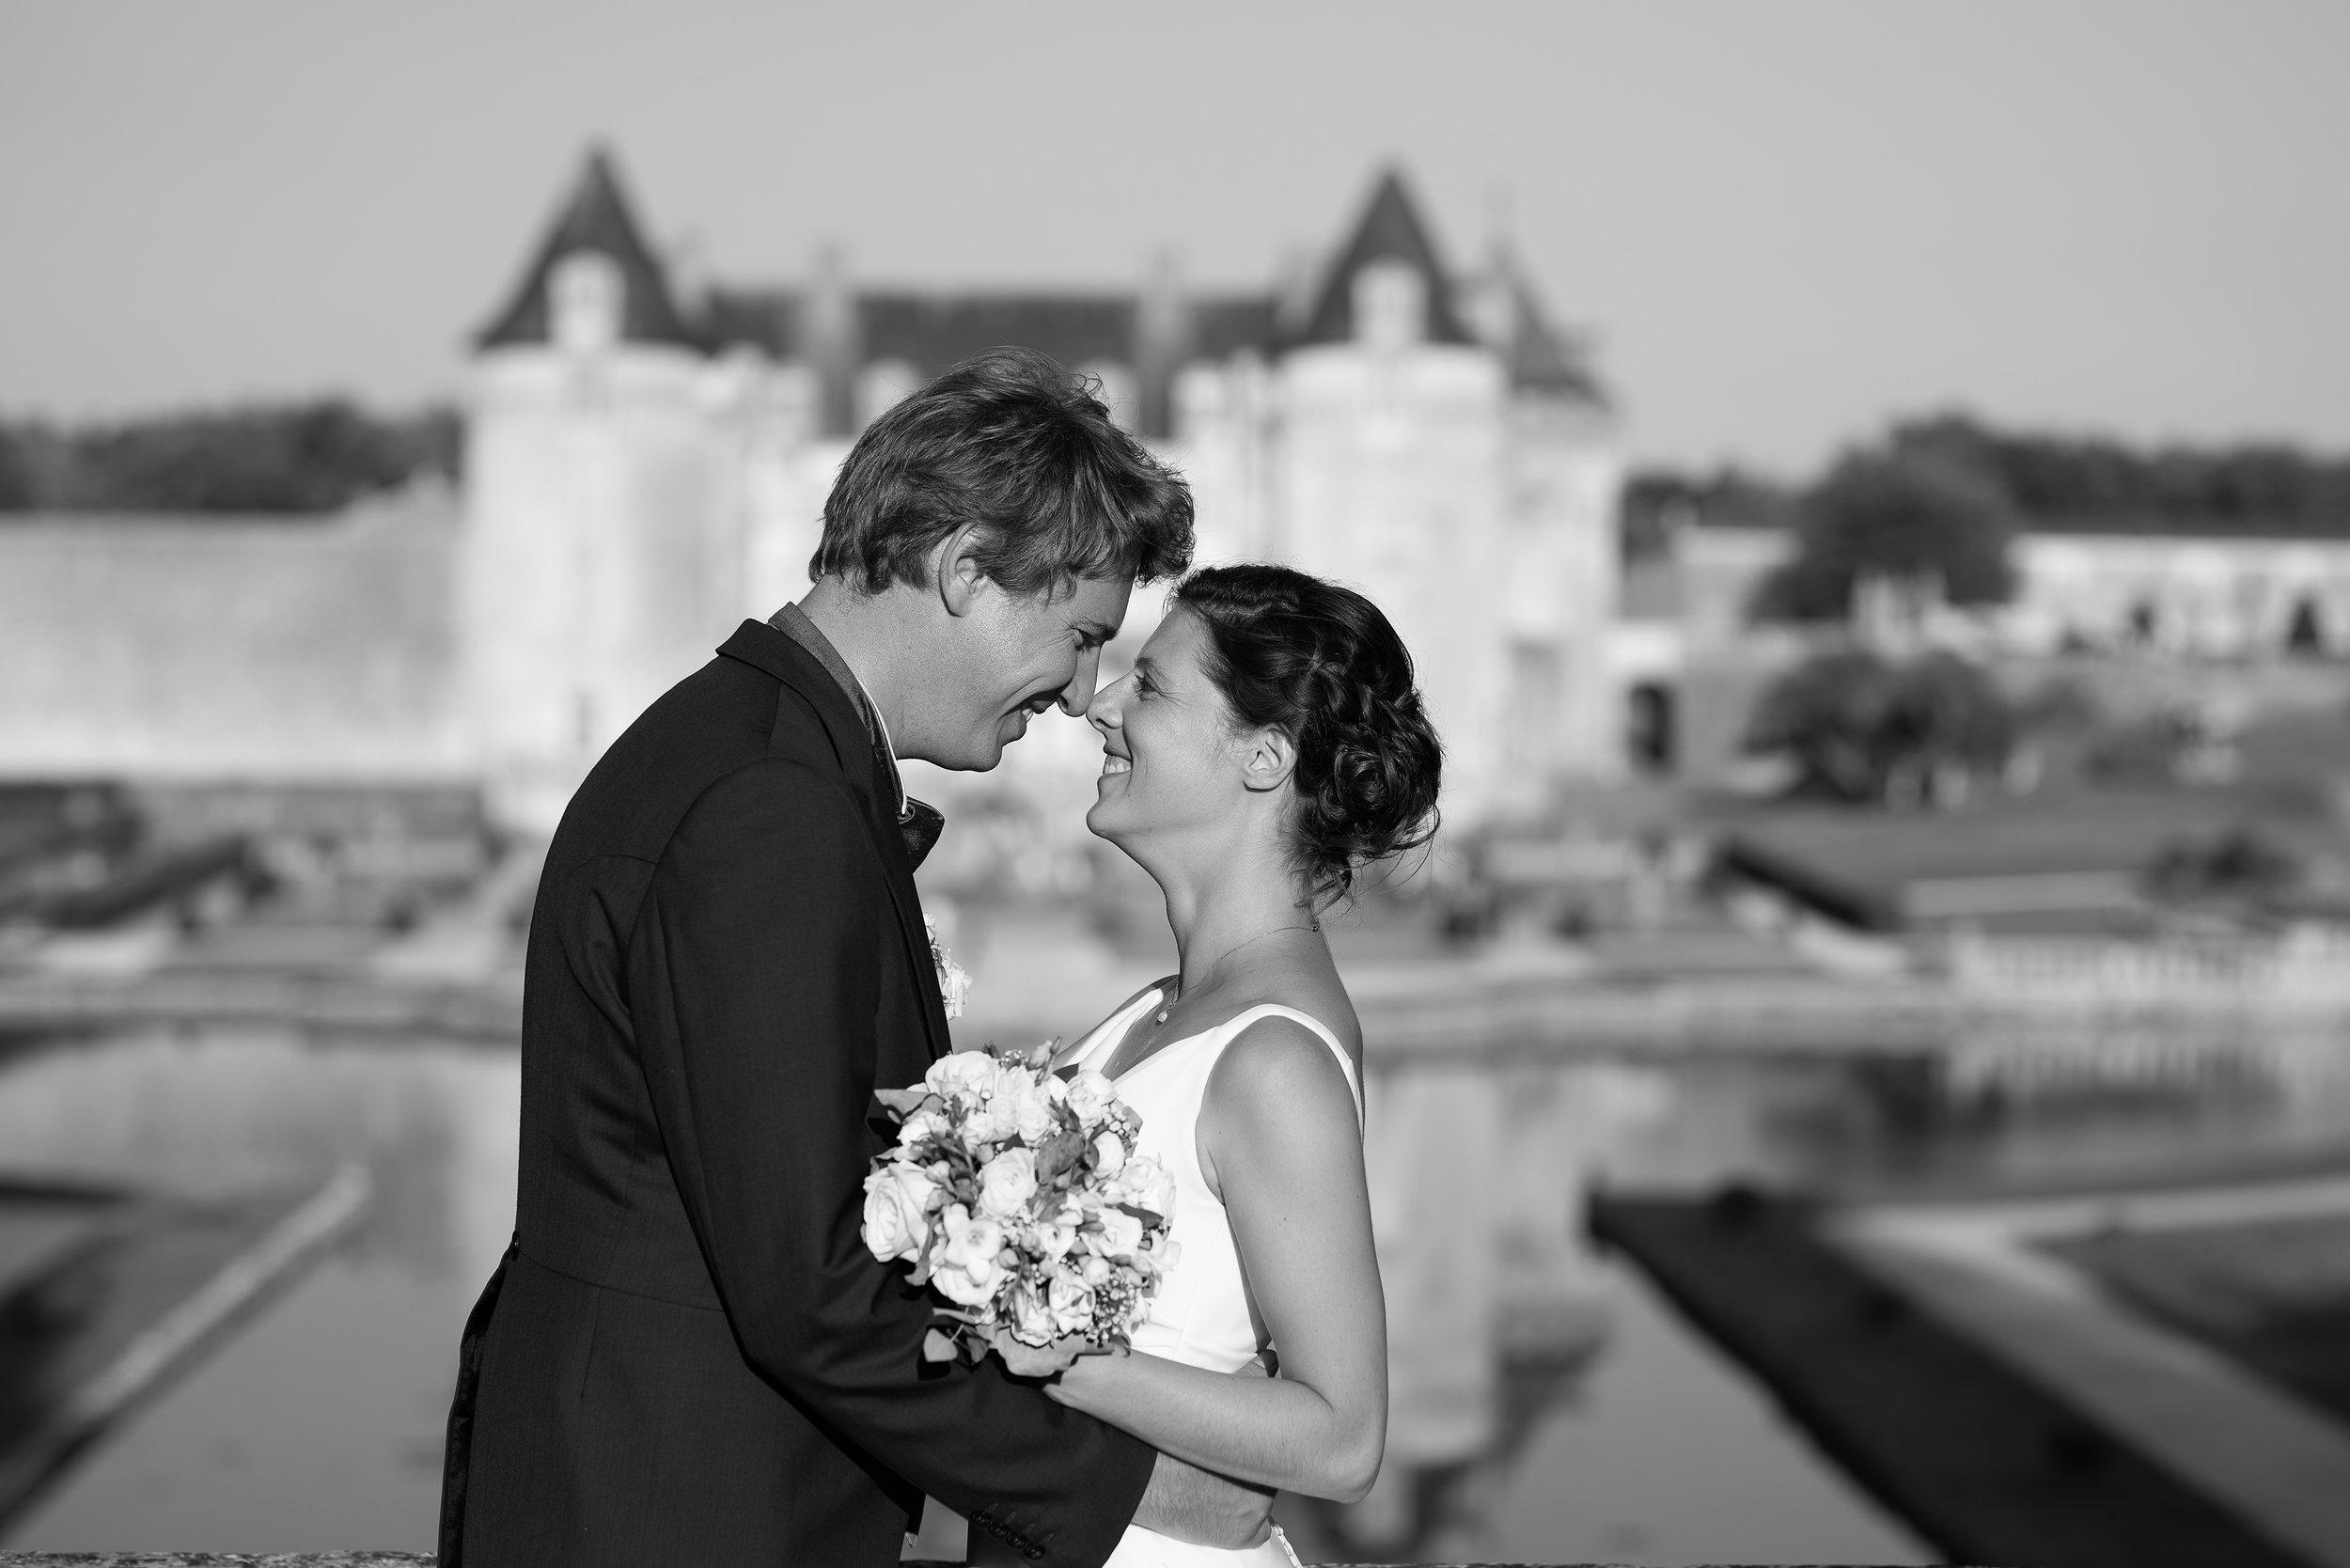 photographe-mariage-chateau-la-roche-courbon-353.jpg